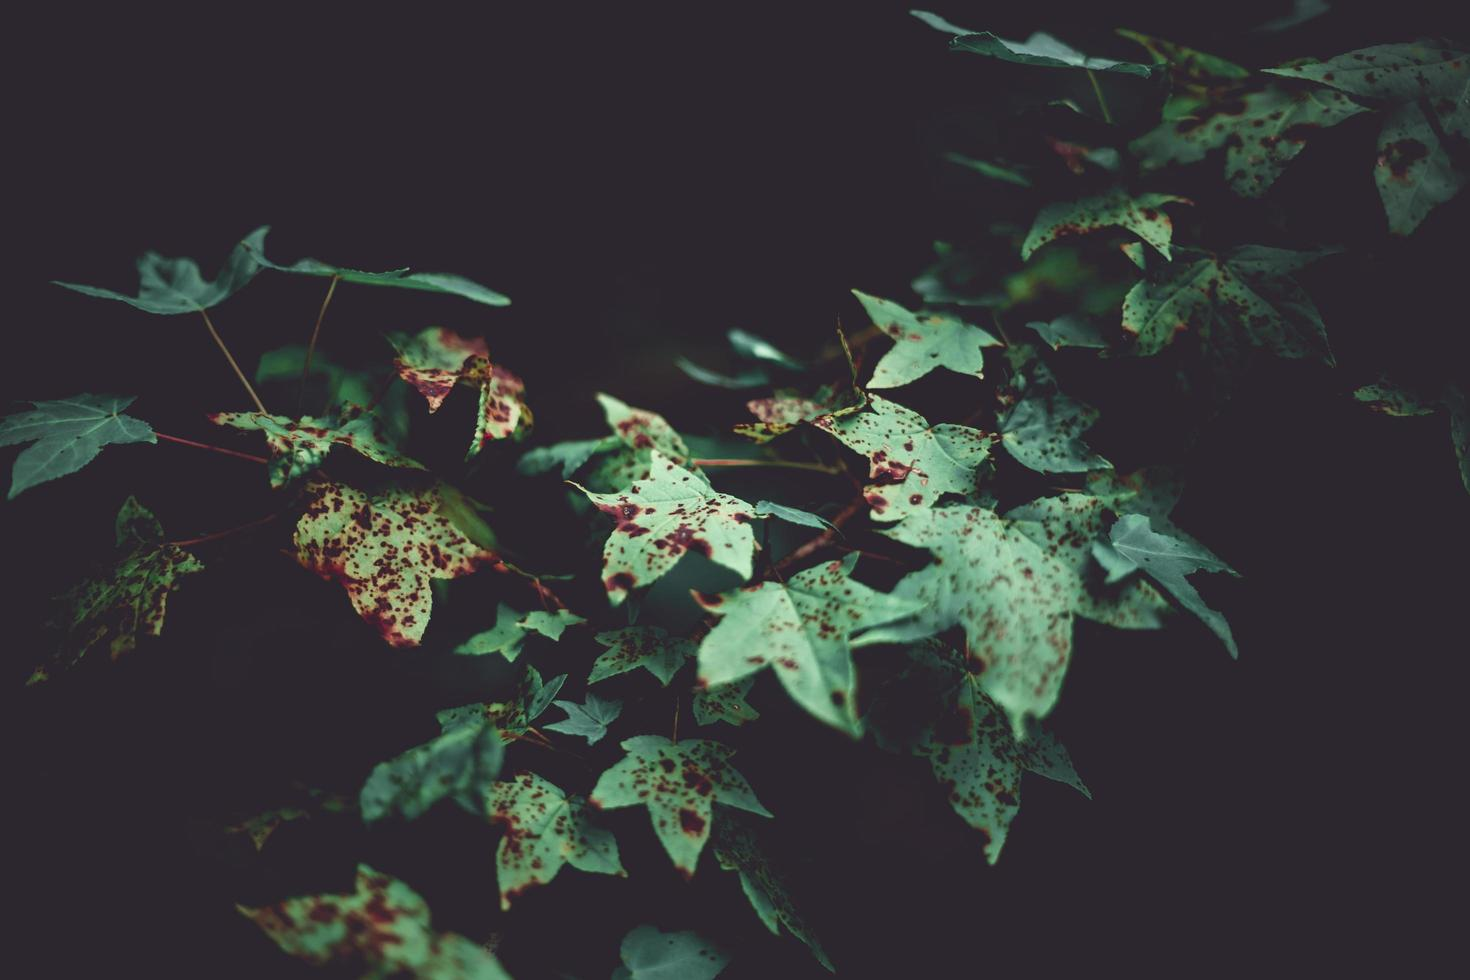 Kaugummiblätter im Herbst foto